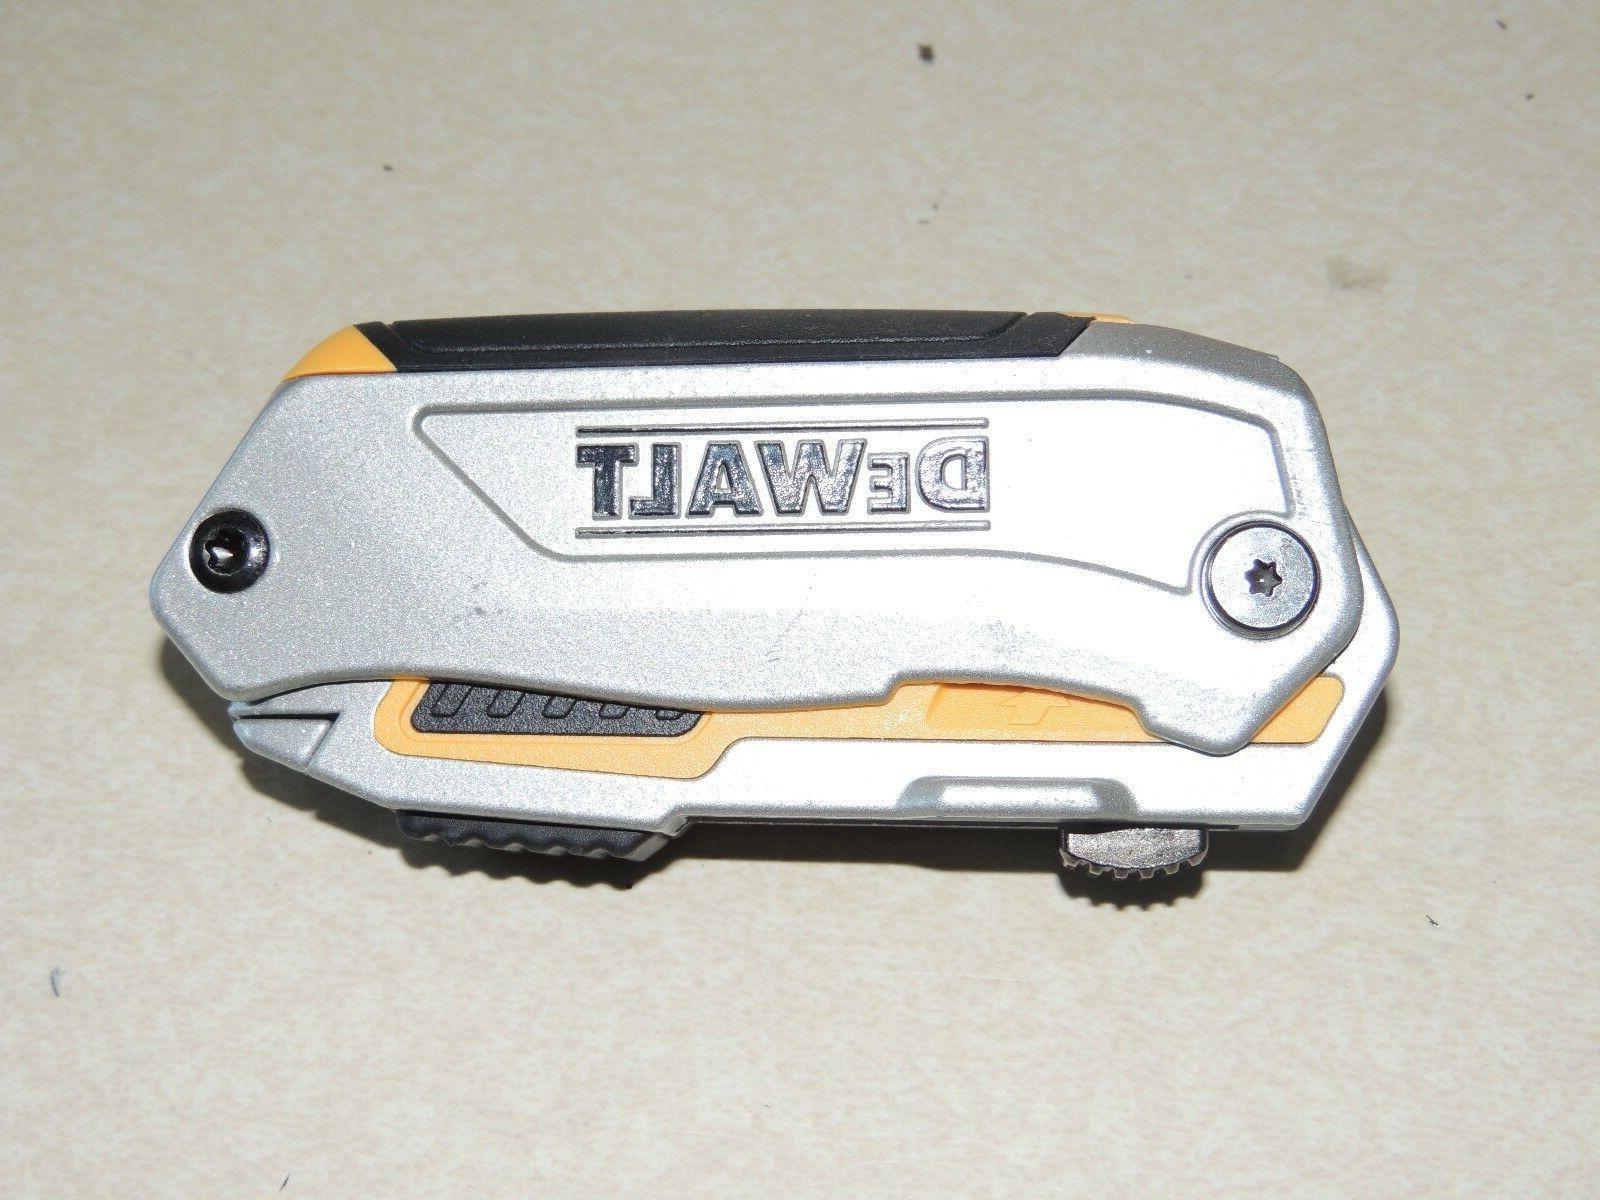 NEW! DEWALT-DWHT10296 Folding Retractable Utility Knife Box